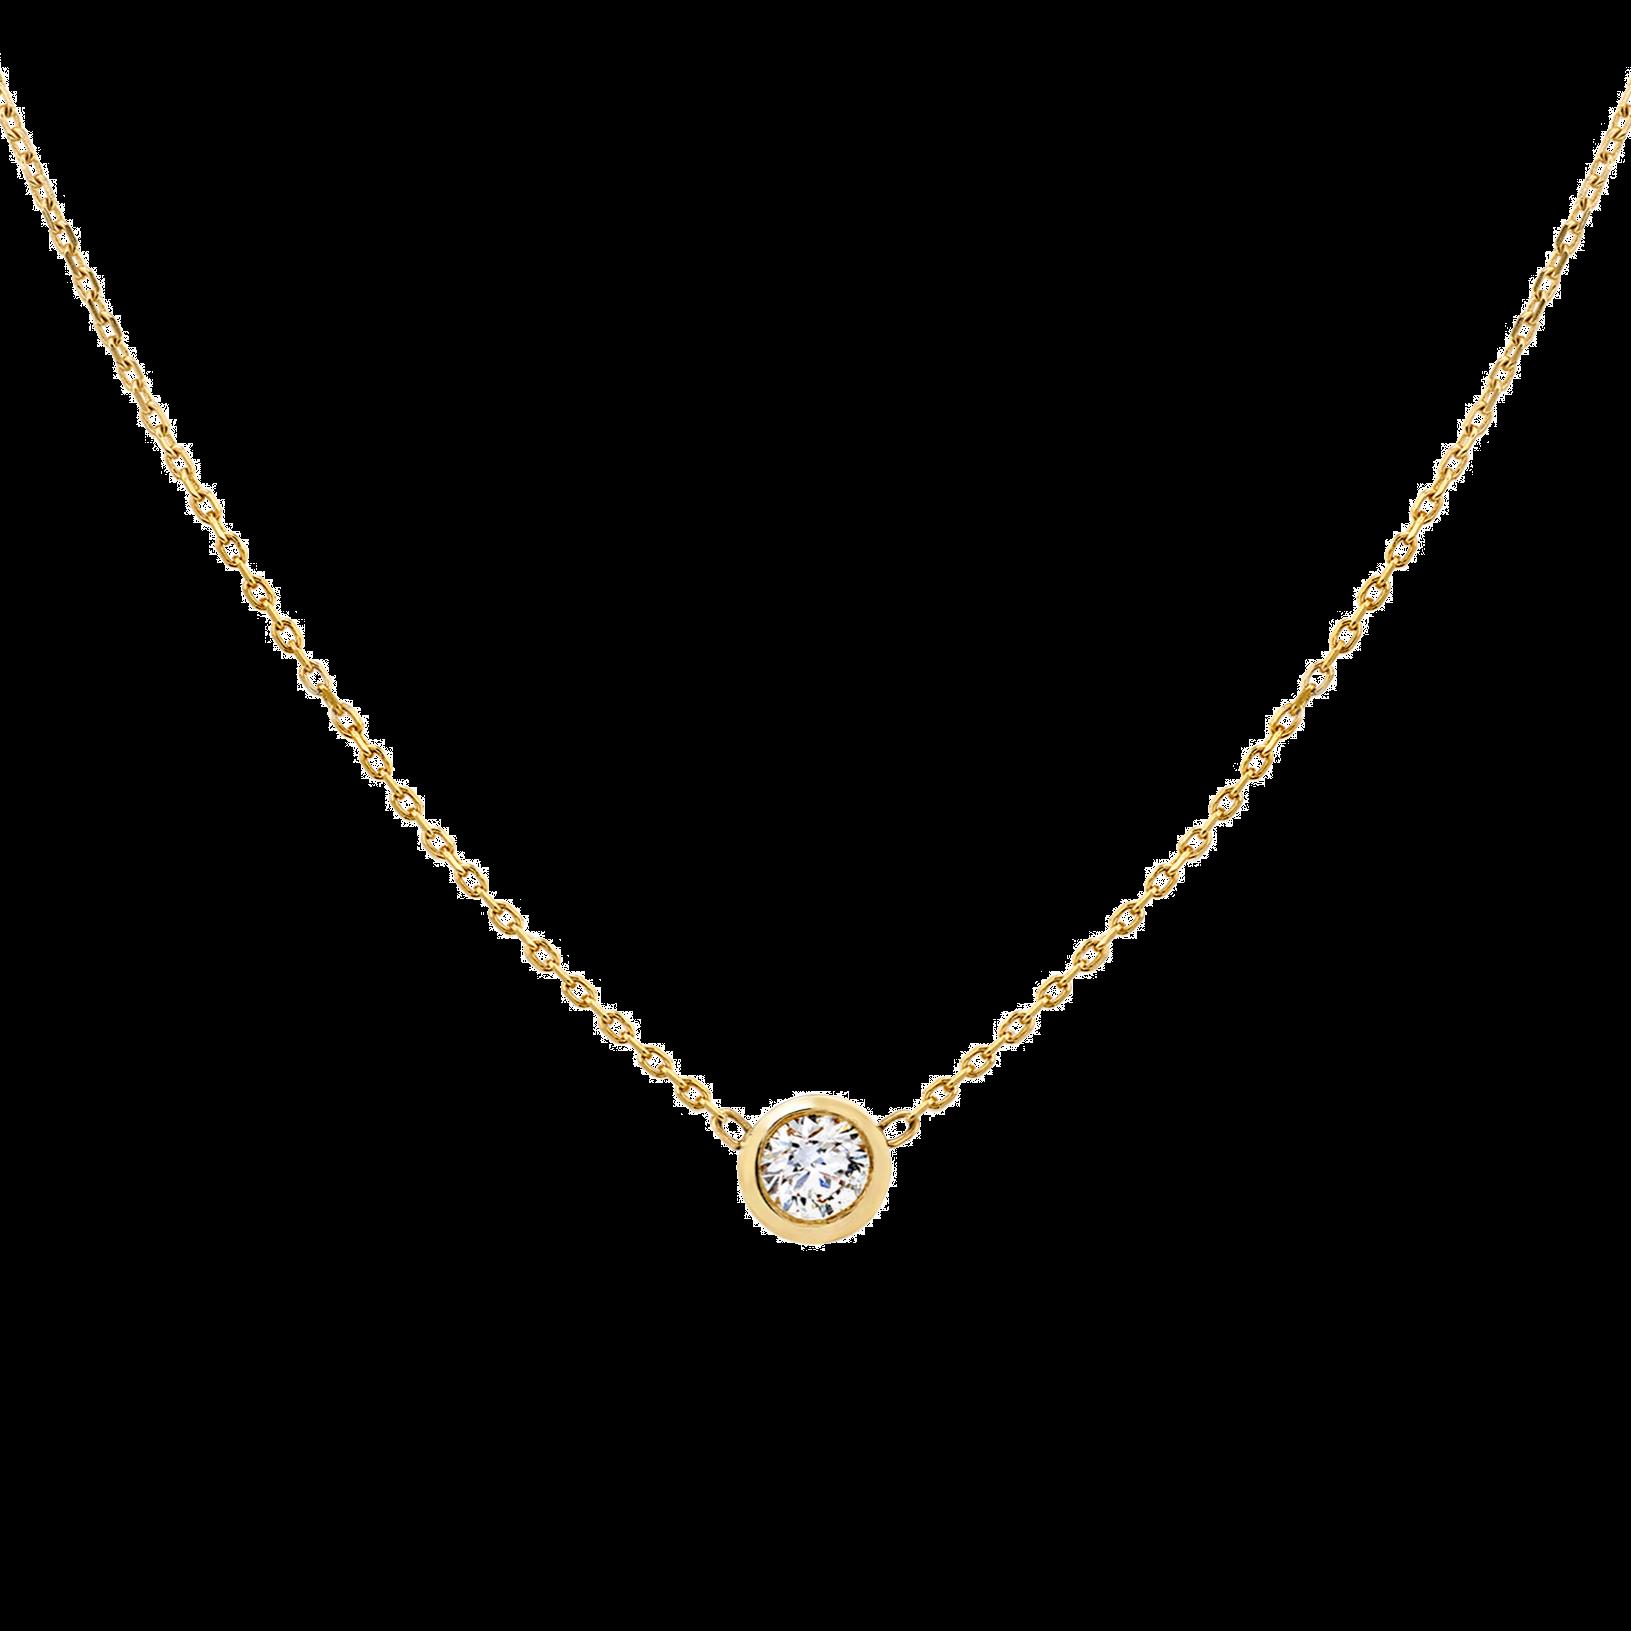 Round Diamond Bezel Necklace